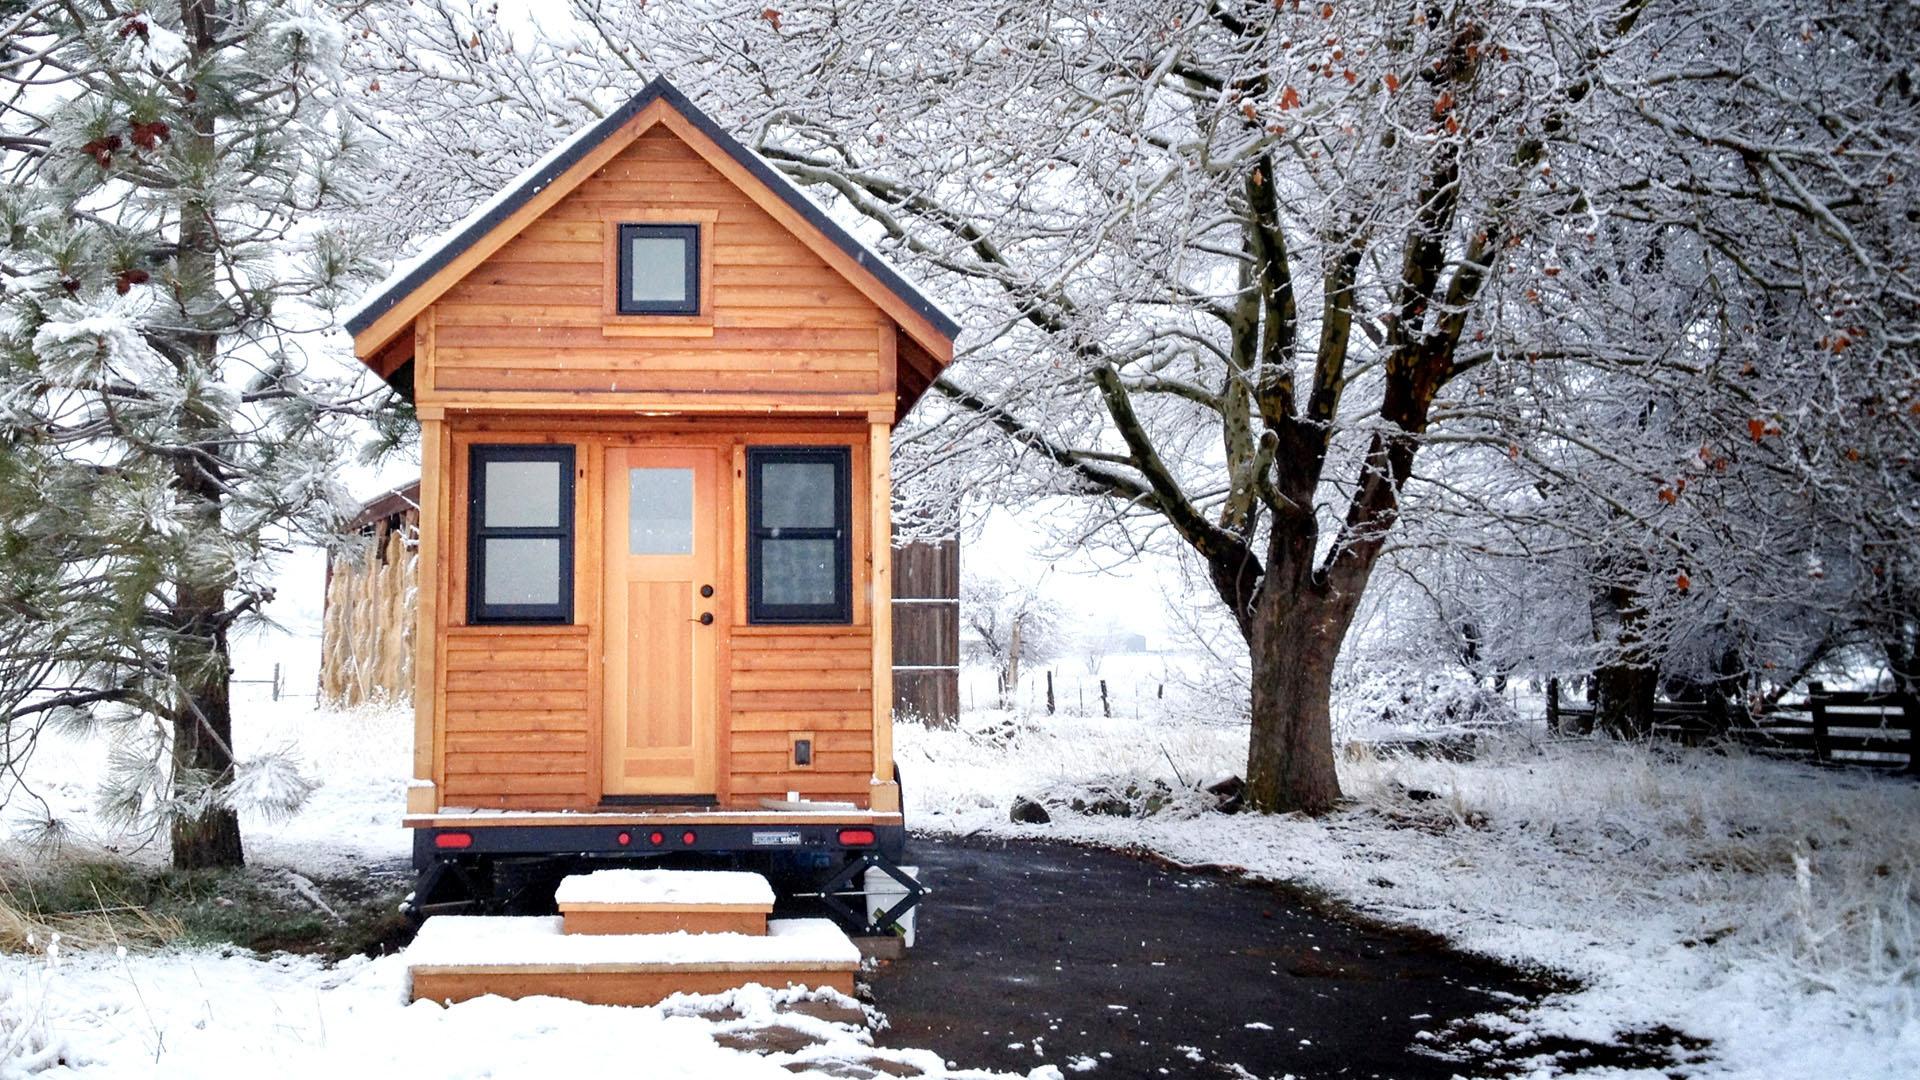 tiny house big living. Black Bedroom Furniture Sets. Home Design Ideas